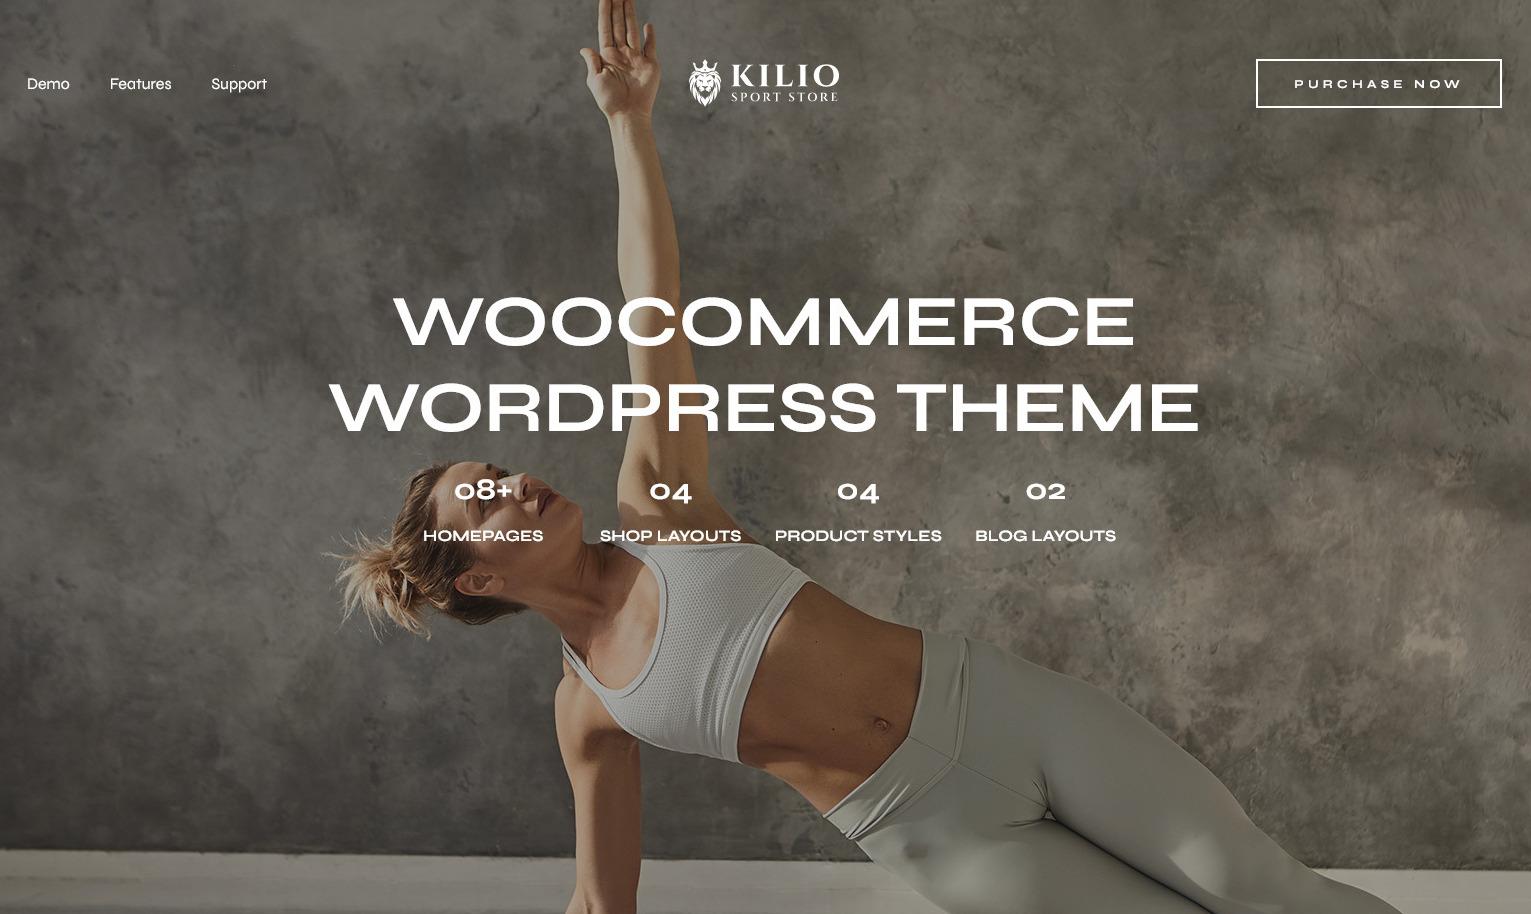 Kilio Sport WordPress Sports and Sporting Goods Theme